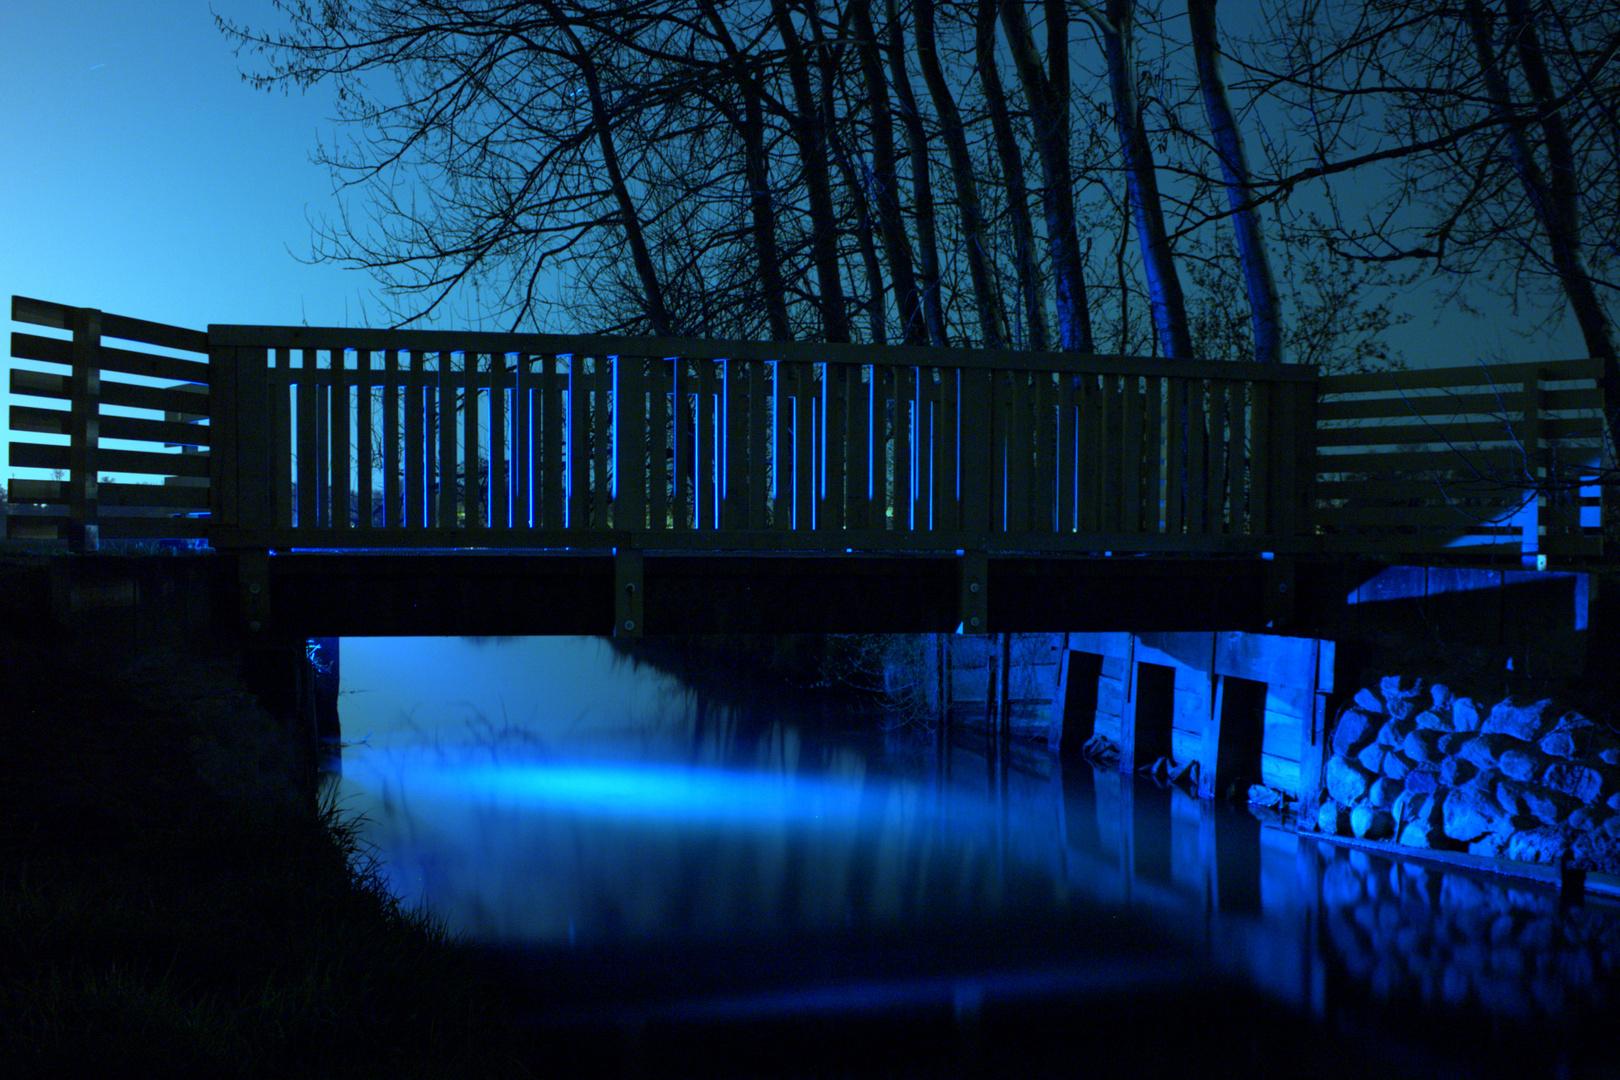 Blue Bridge 2.0